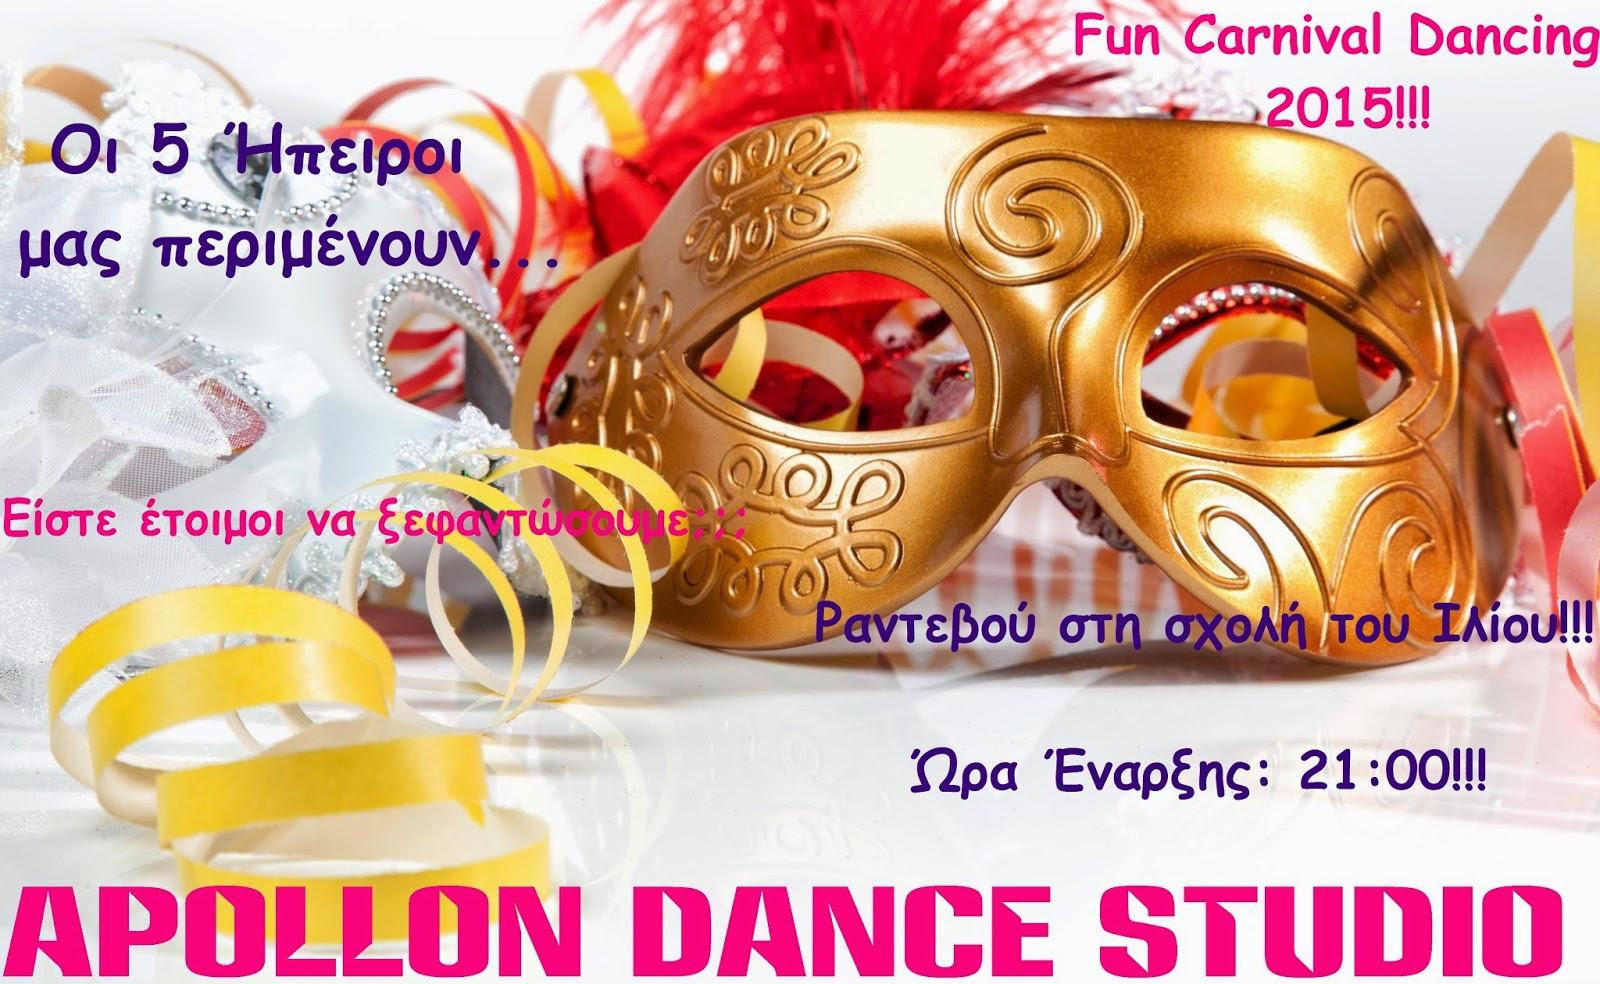 64360b1257 Apollon dance studio  Fun Carnival Dancing 2015 - 5 Ήπειροι!!!